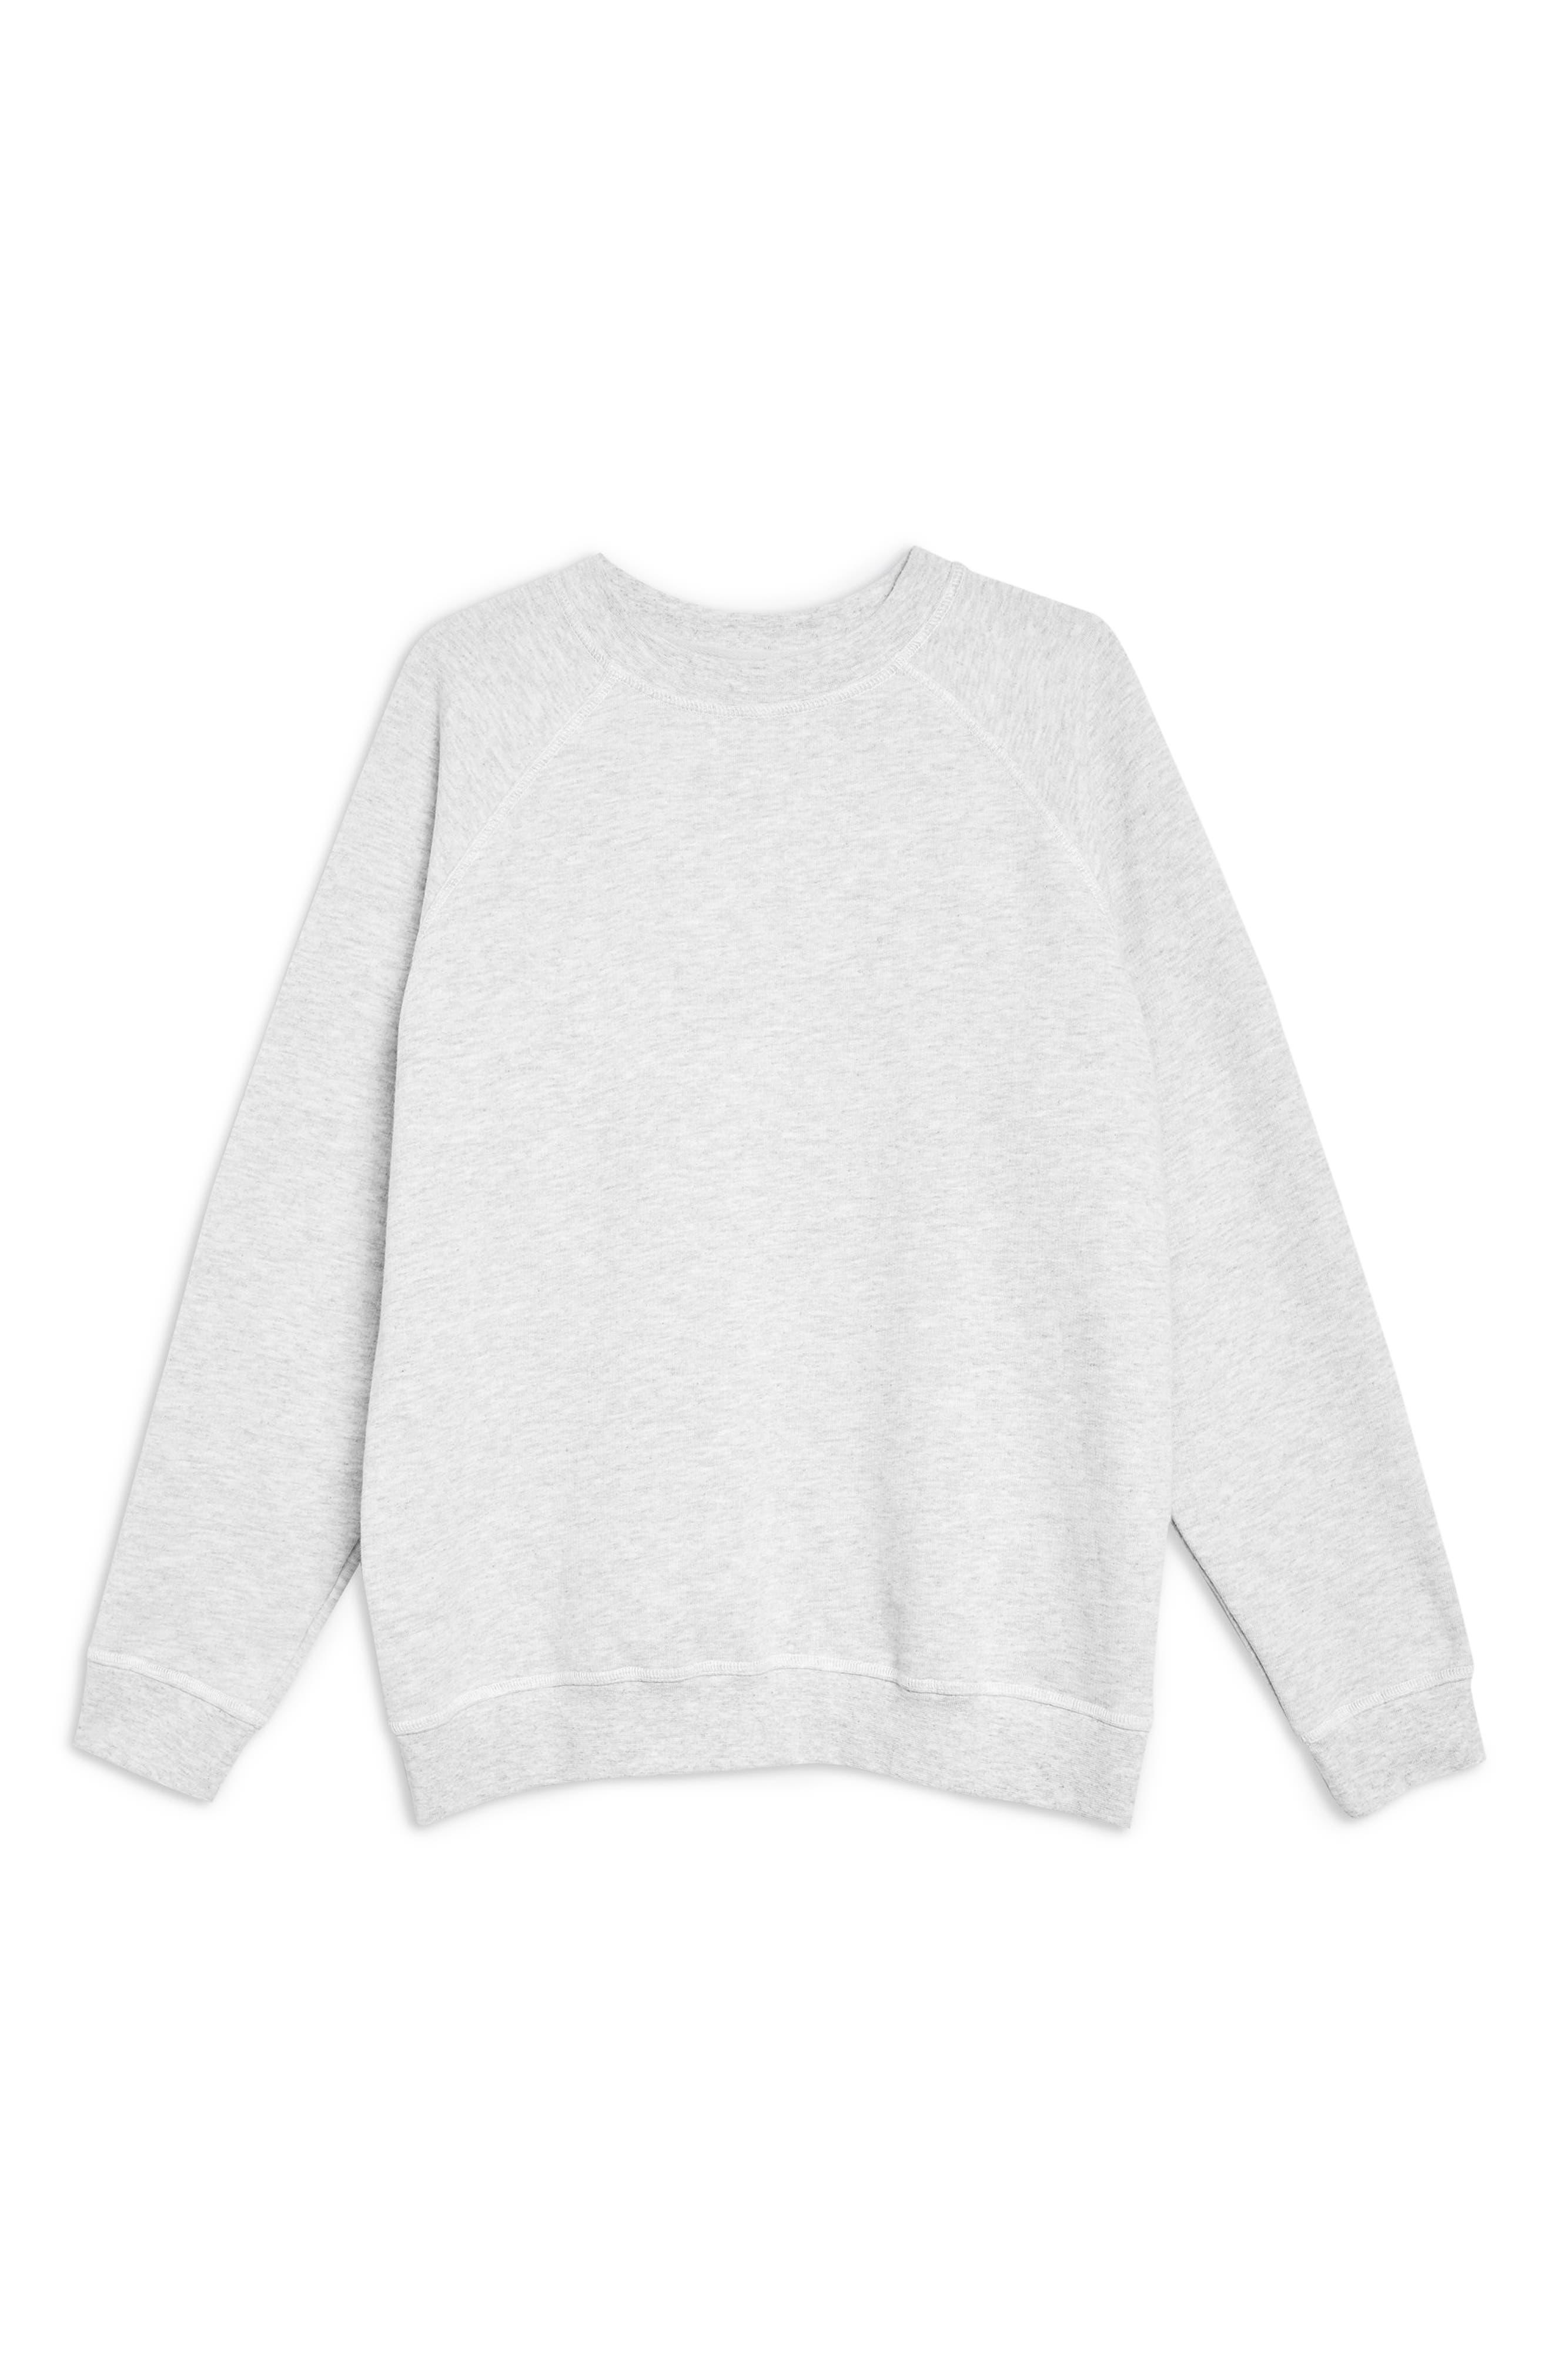 Crewneck Sweatshirt,                             Alternate thumbnail 4, color,                             GREY